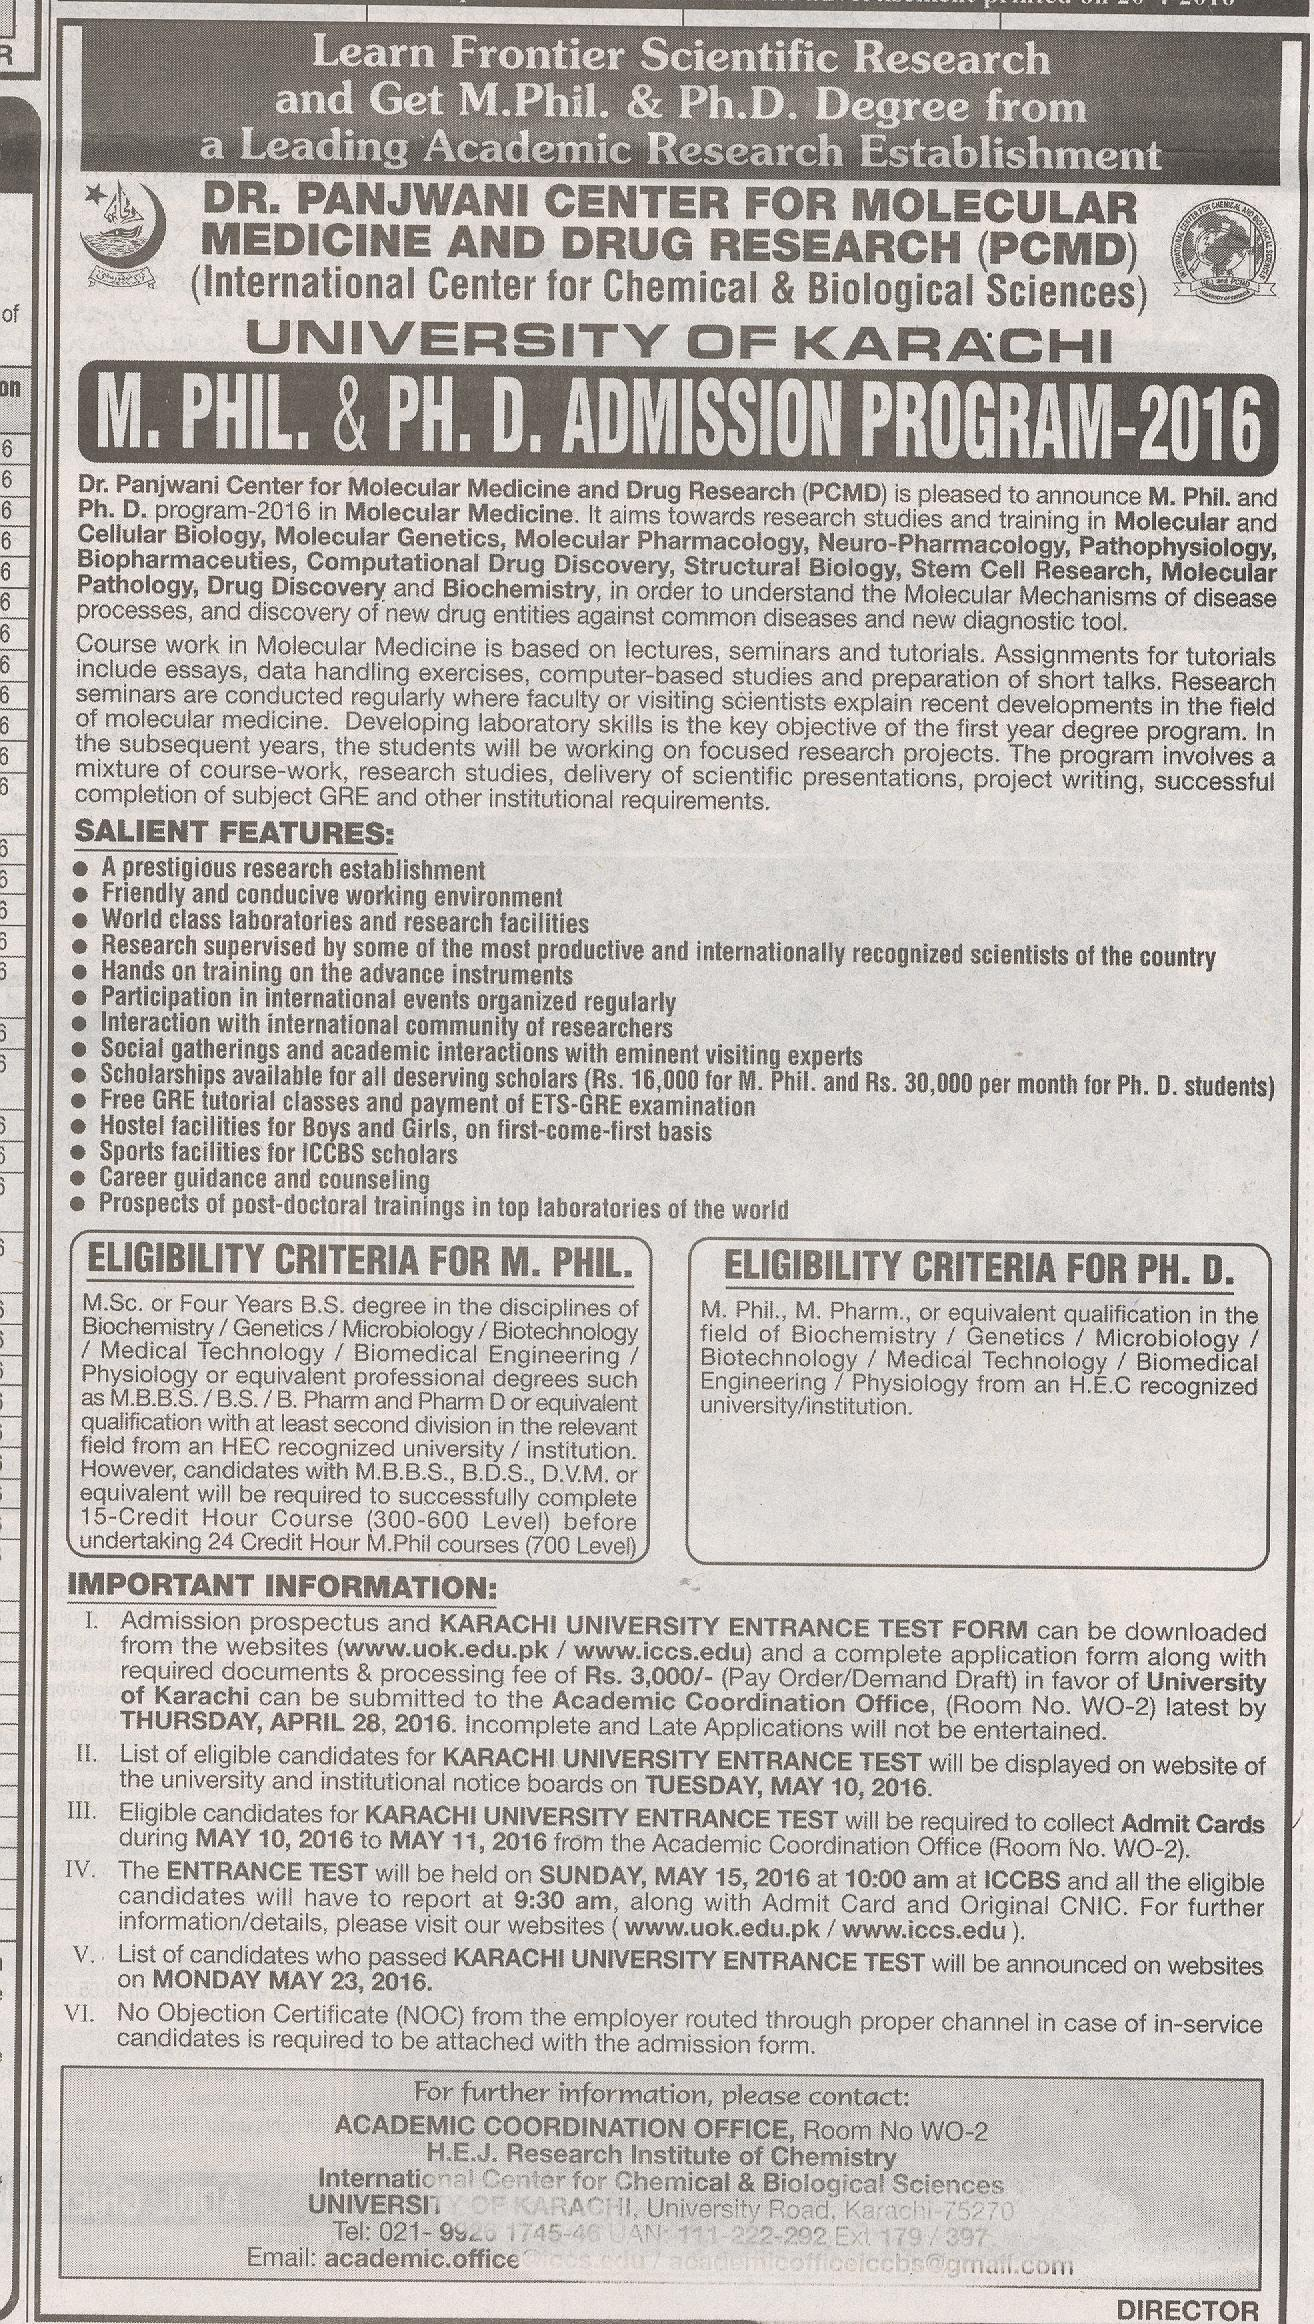 Dr Panjwani Center for Molecular Medicine and Drug Research admission 2016